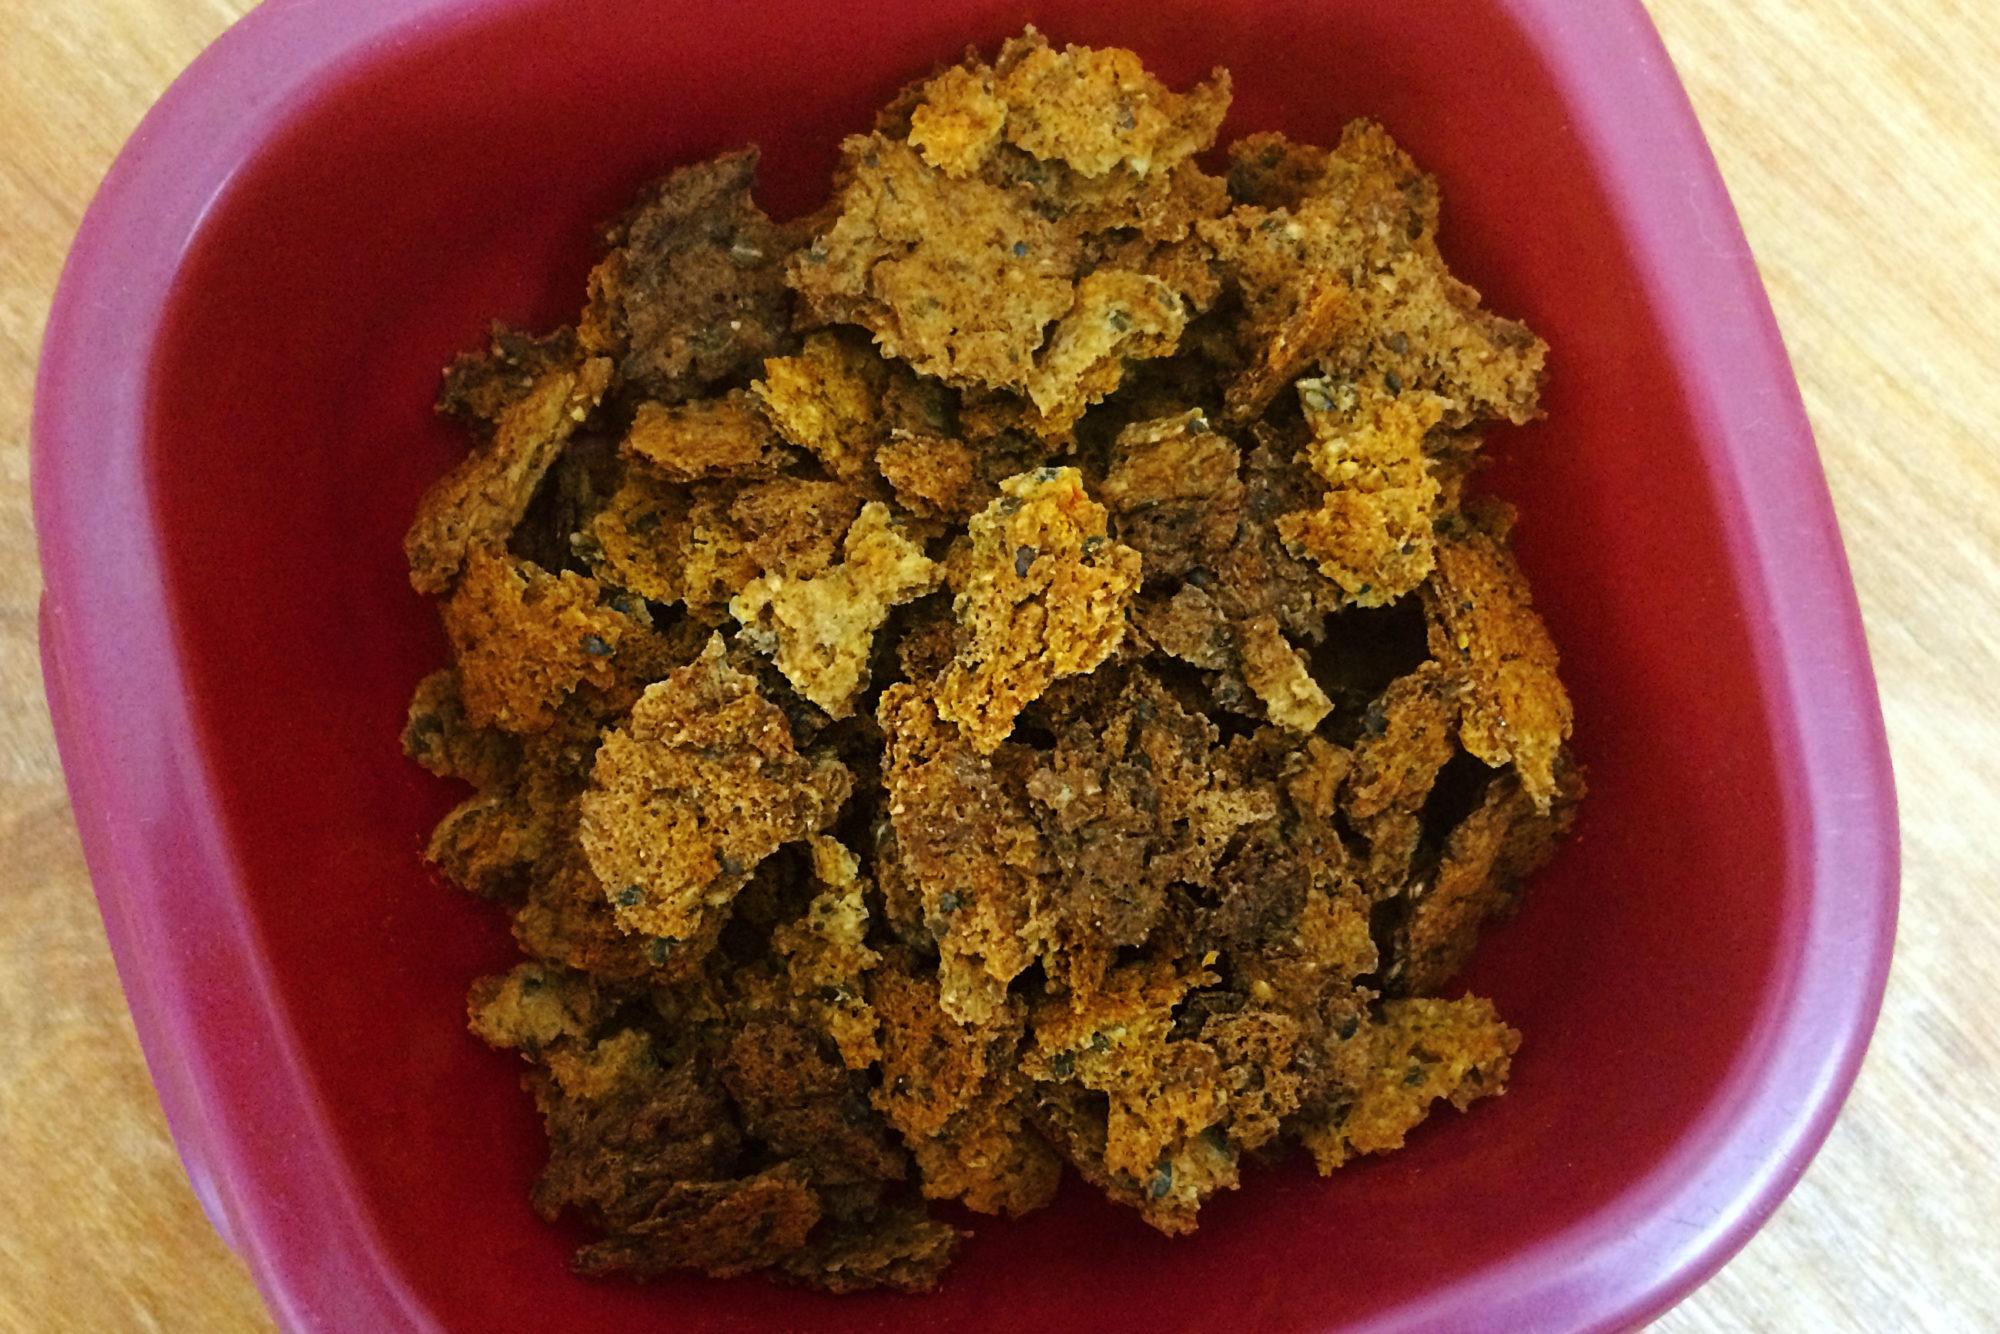 Homemade Dry Vegan Dog Food